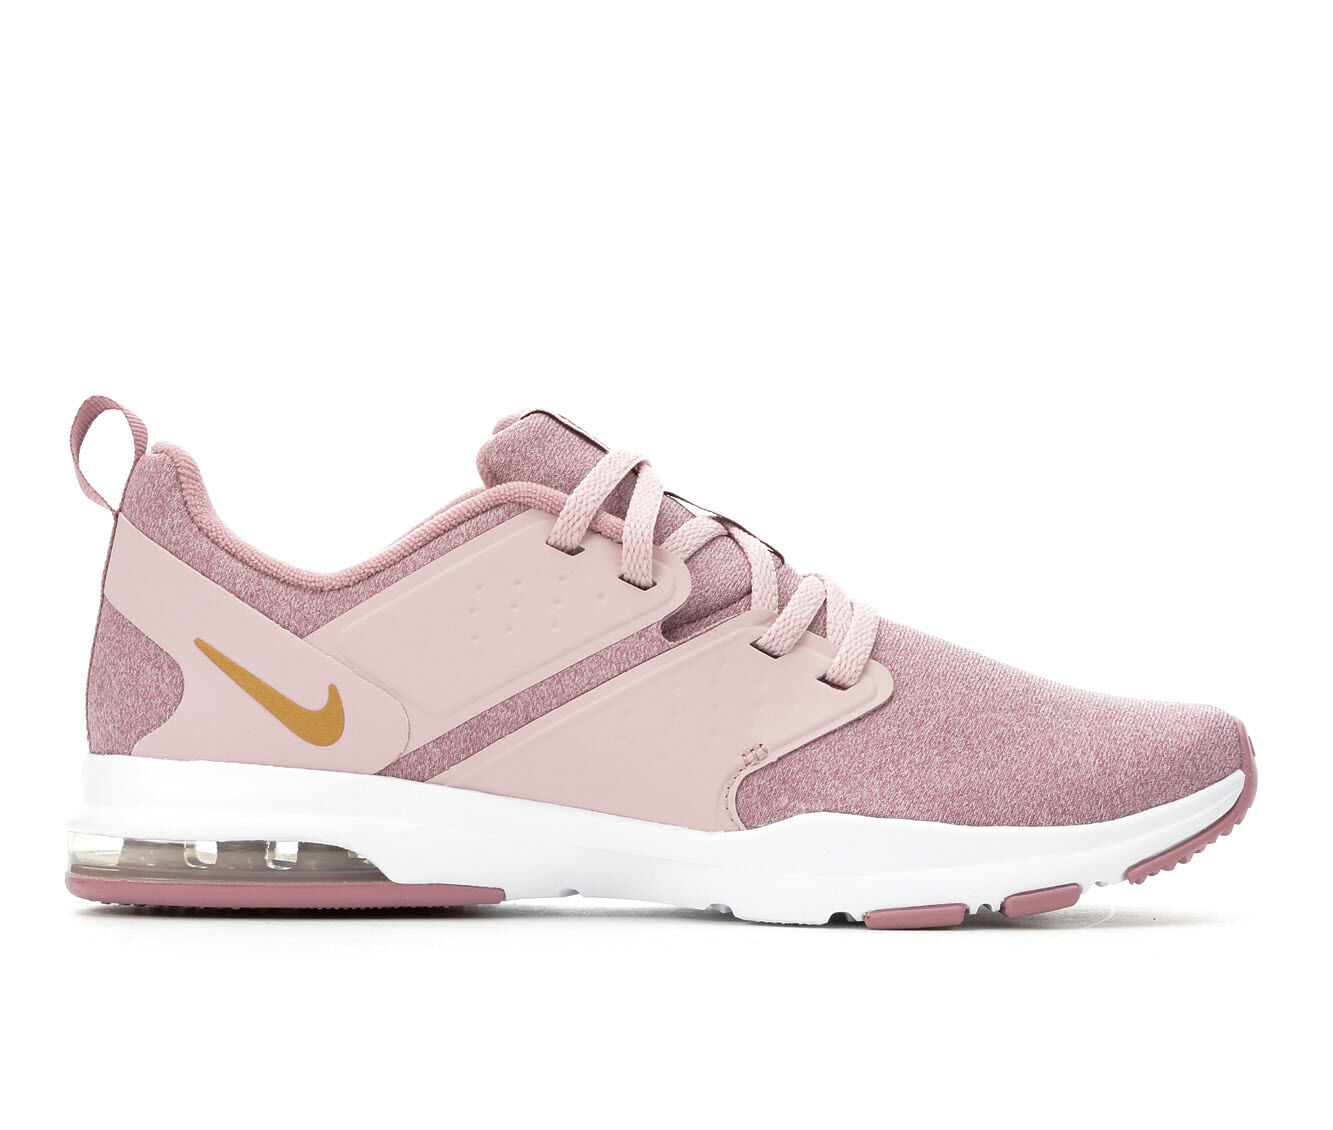 Nike Air Bella TR Women's Cross Training Shoes in 2019